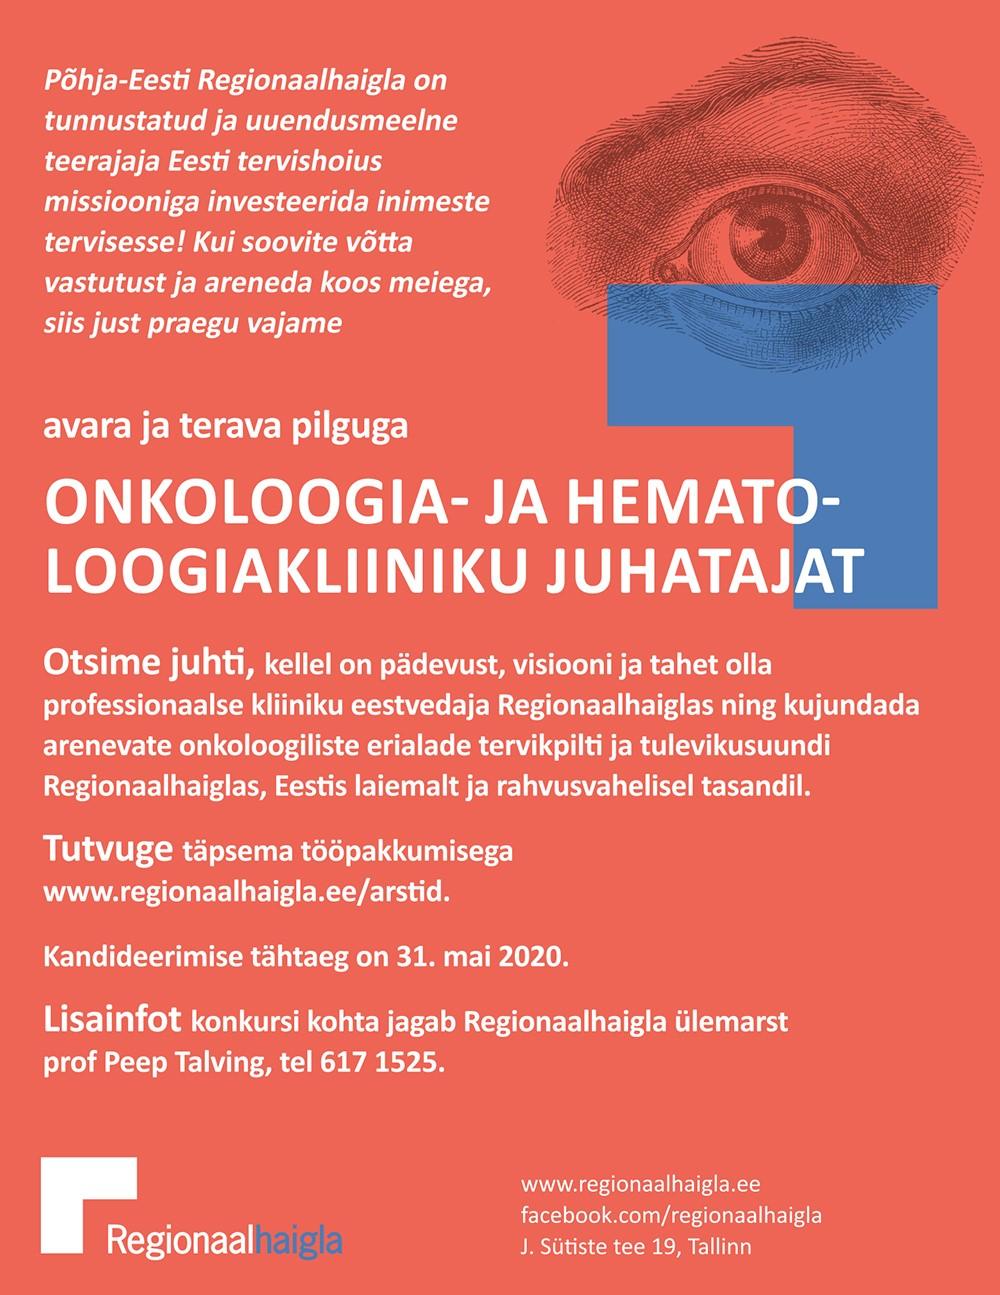 Onkoloogia- ja hematoloogiakliiniku juhataja